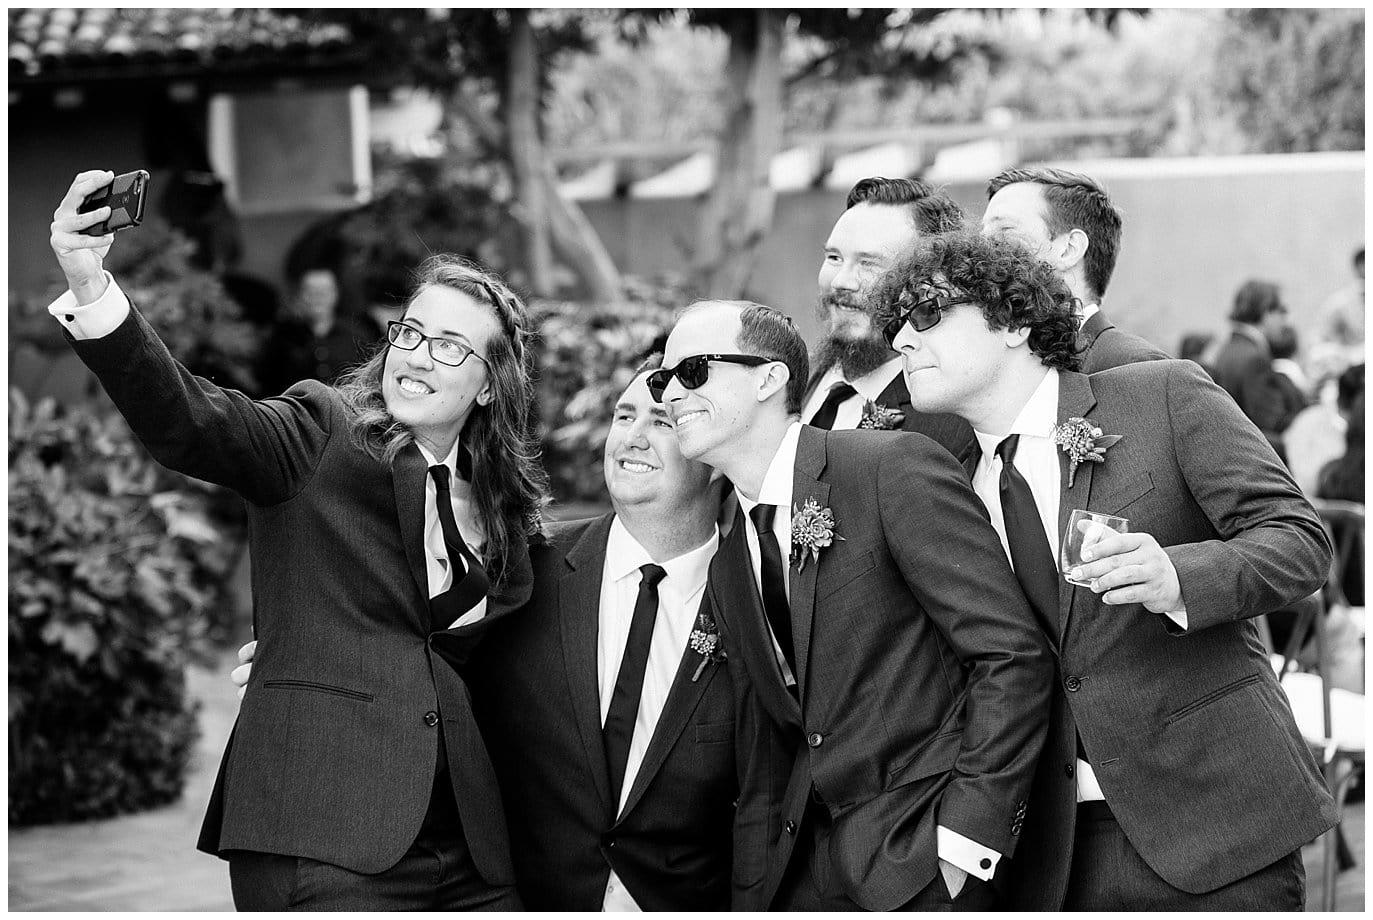 California wedding party selfie photo